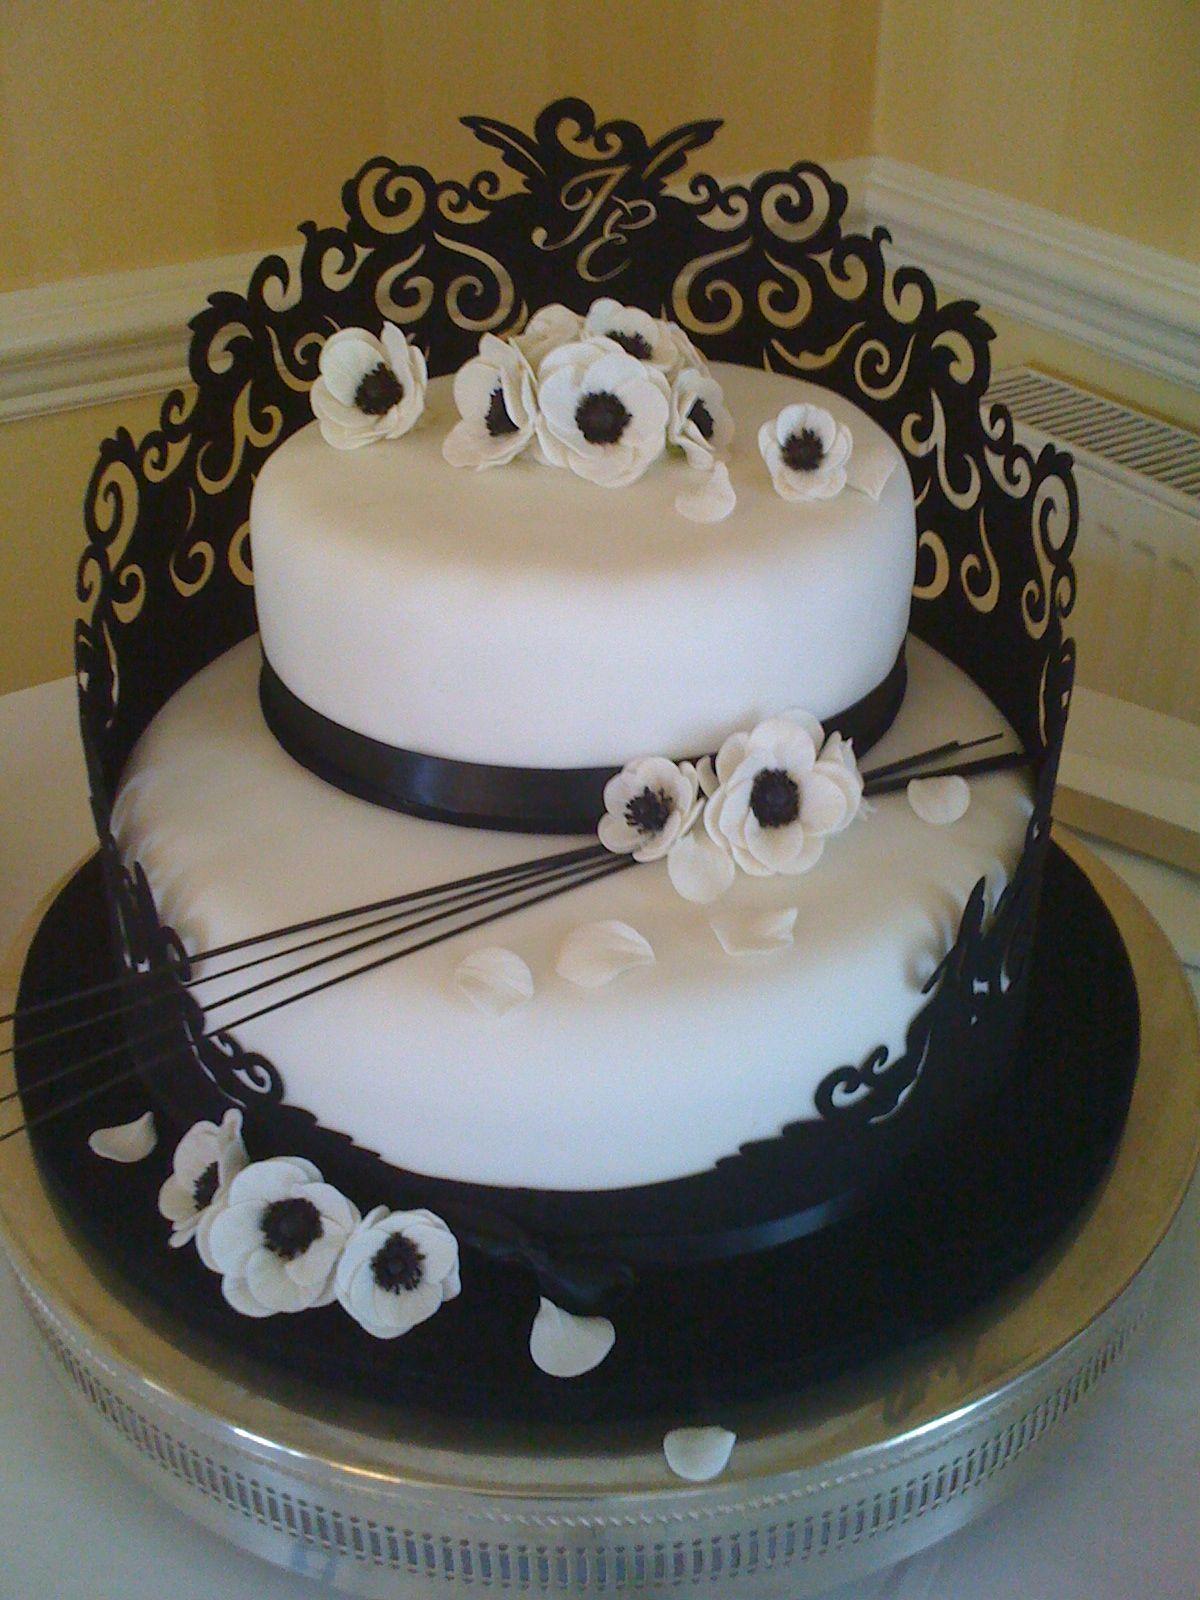 Black And White 2 Tear Wedding Cake (Designed By Mum